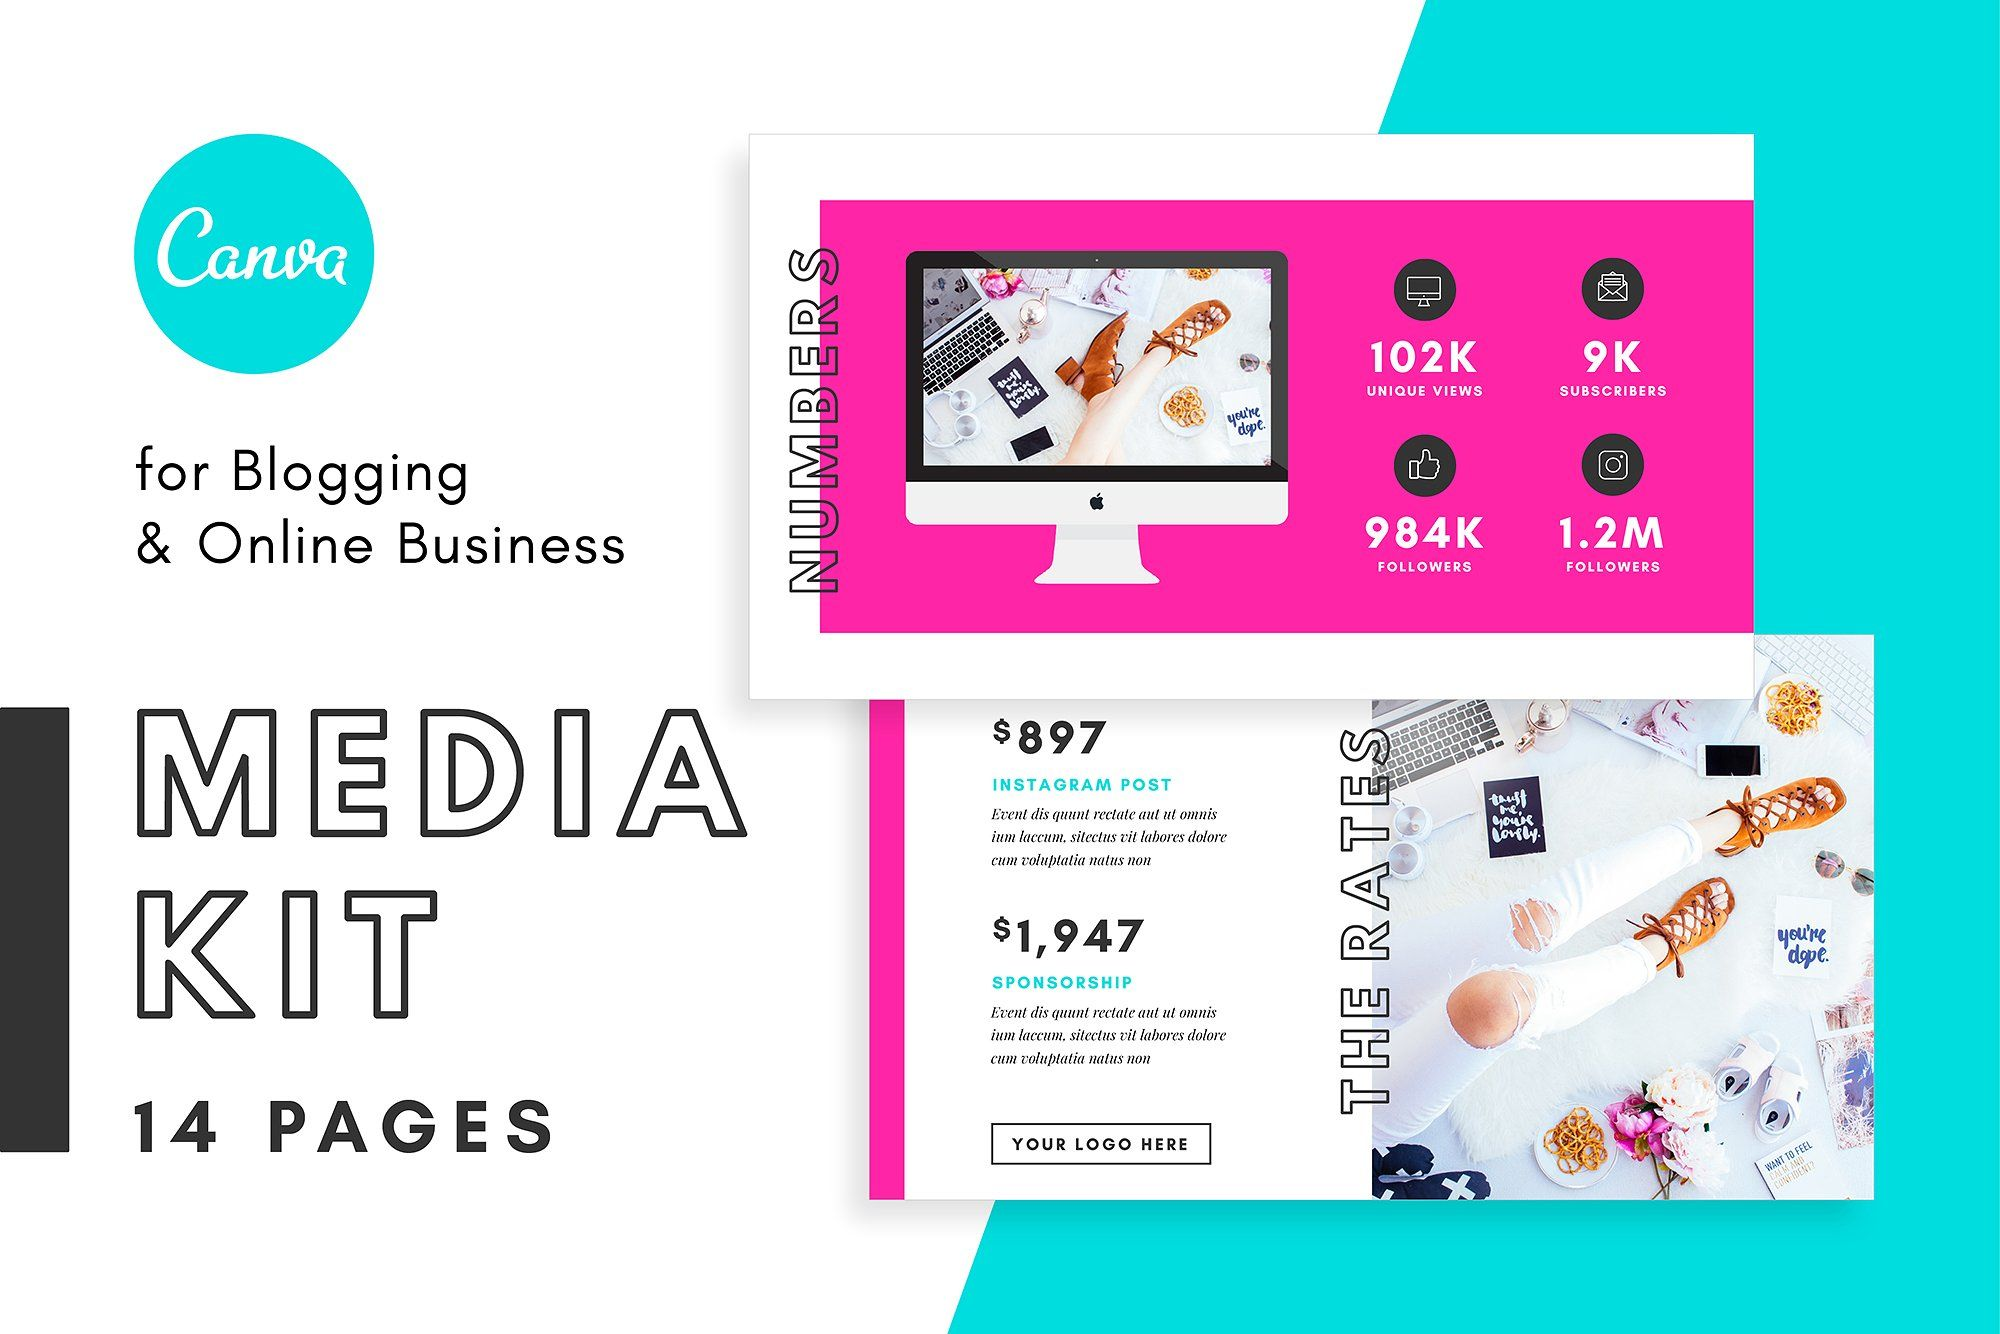 Media Kit/Proposal Bloggers Canva kitinstructionsdesign